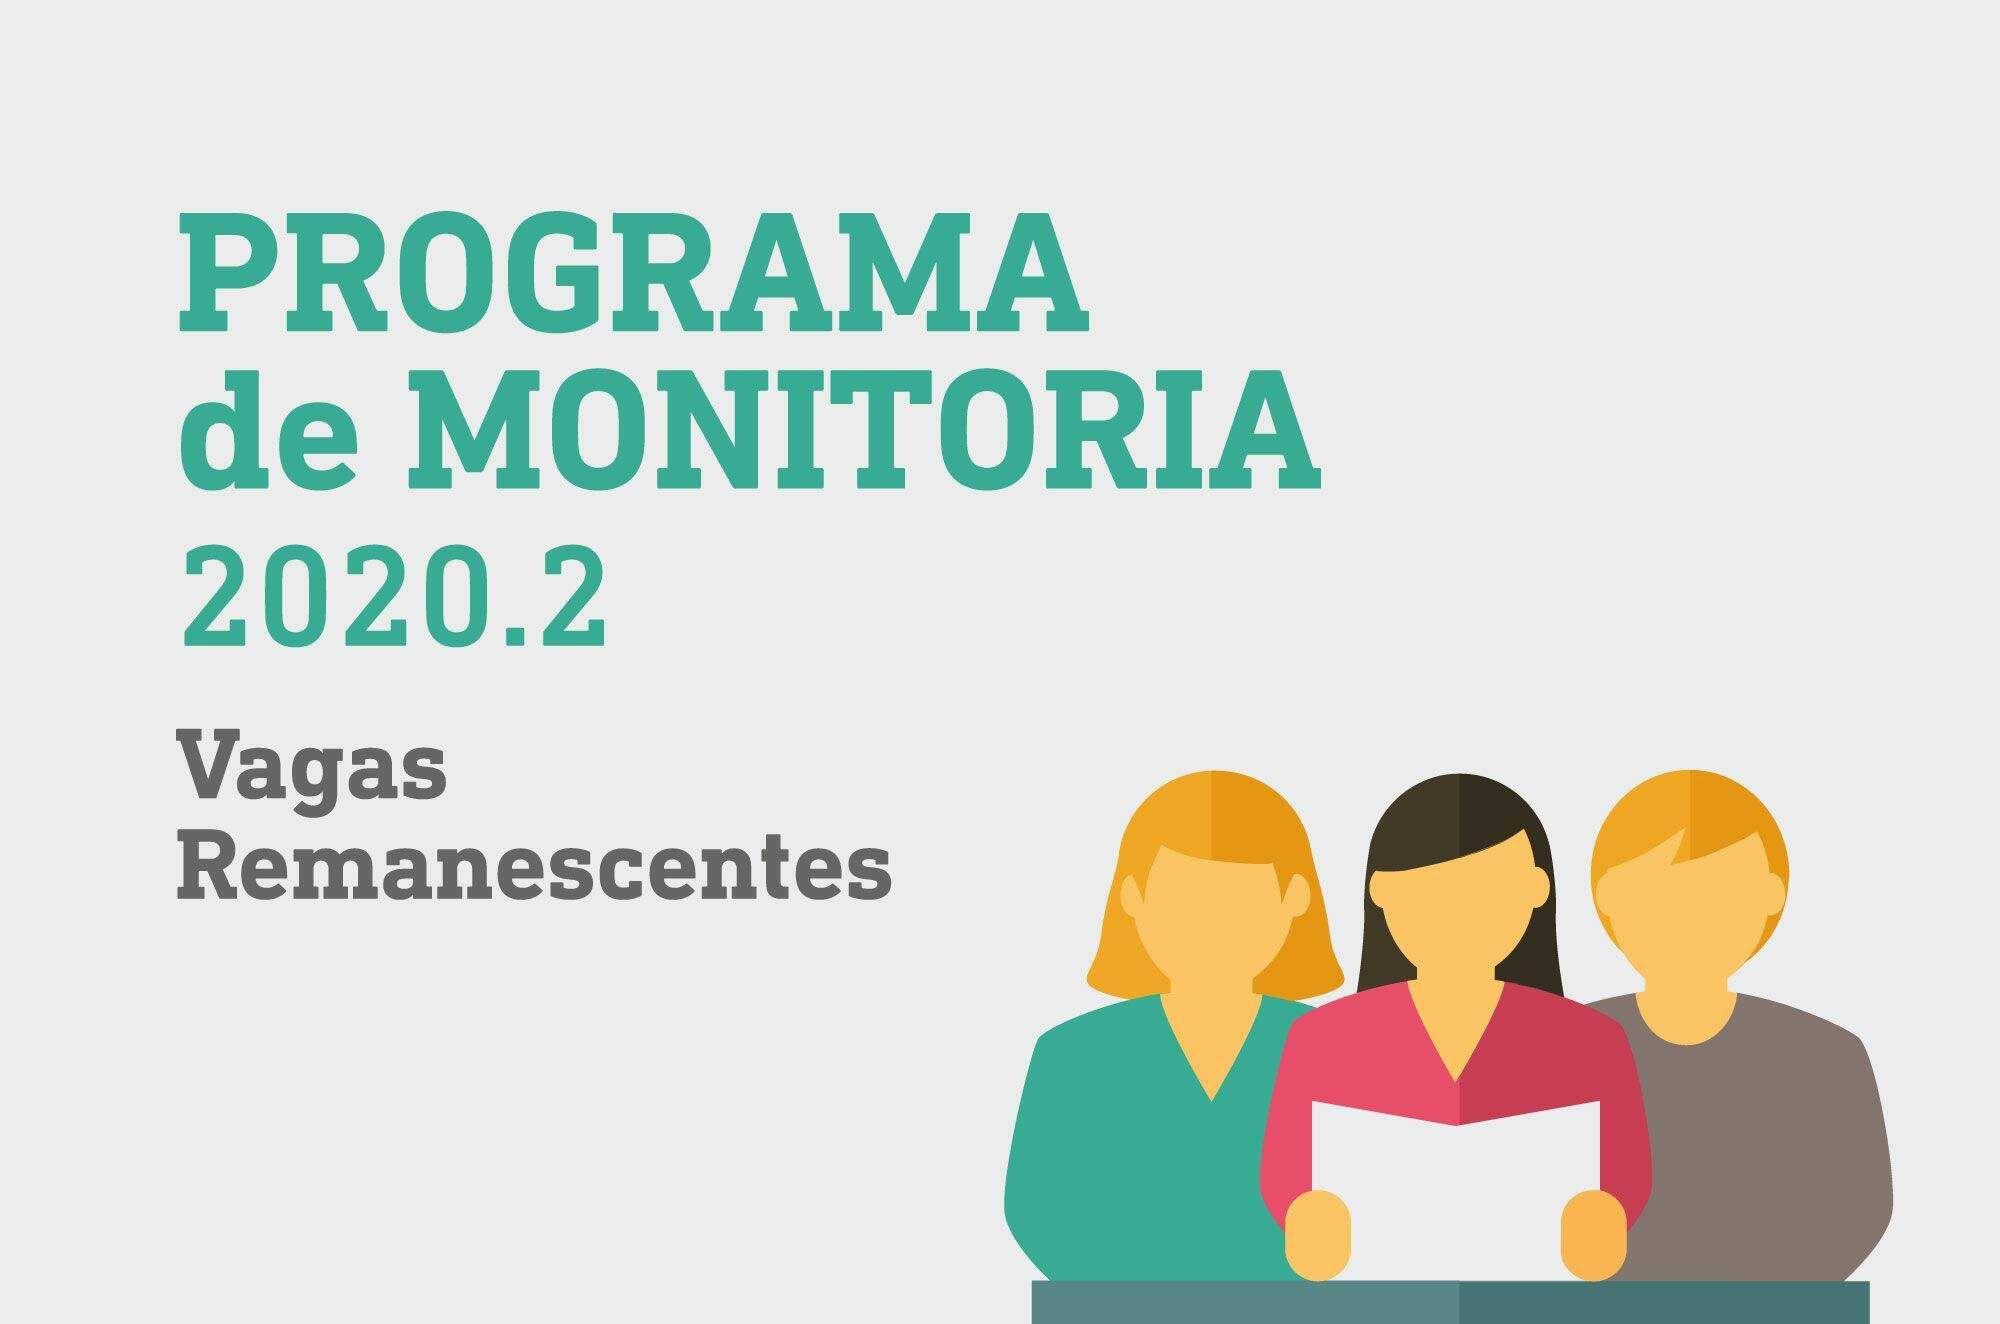 Pograma de Monitoria 2020.2 - Selecionados para entrevistas (vagas remanescentes)